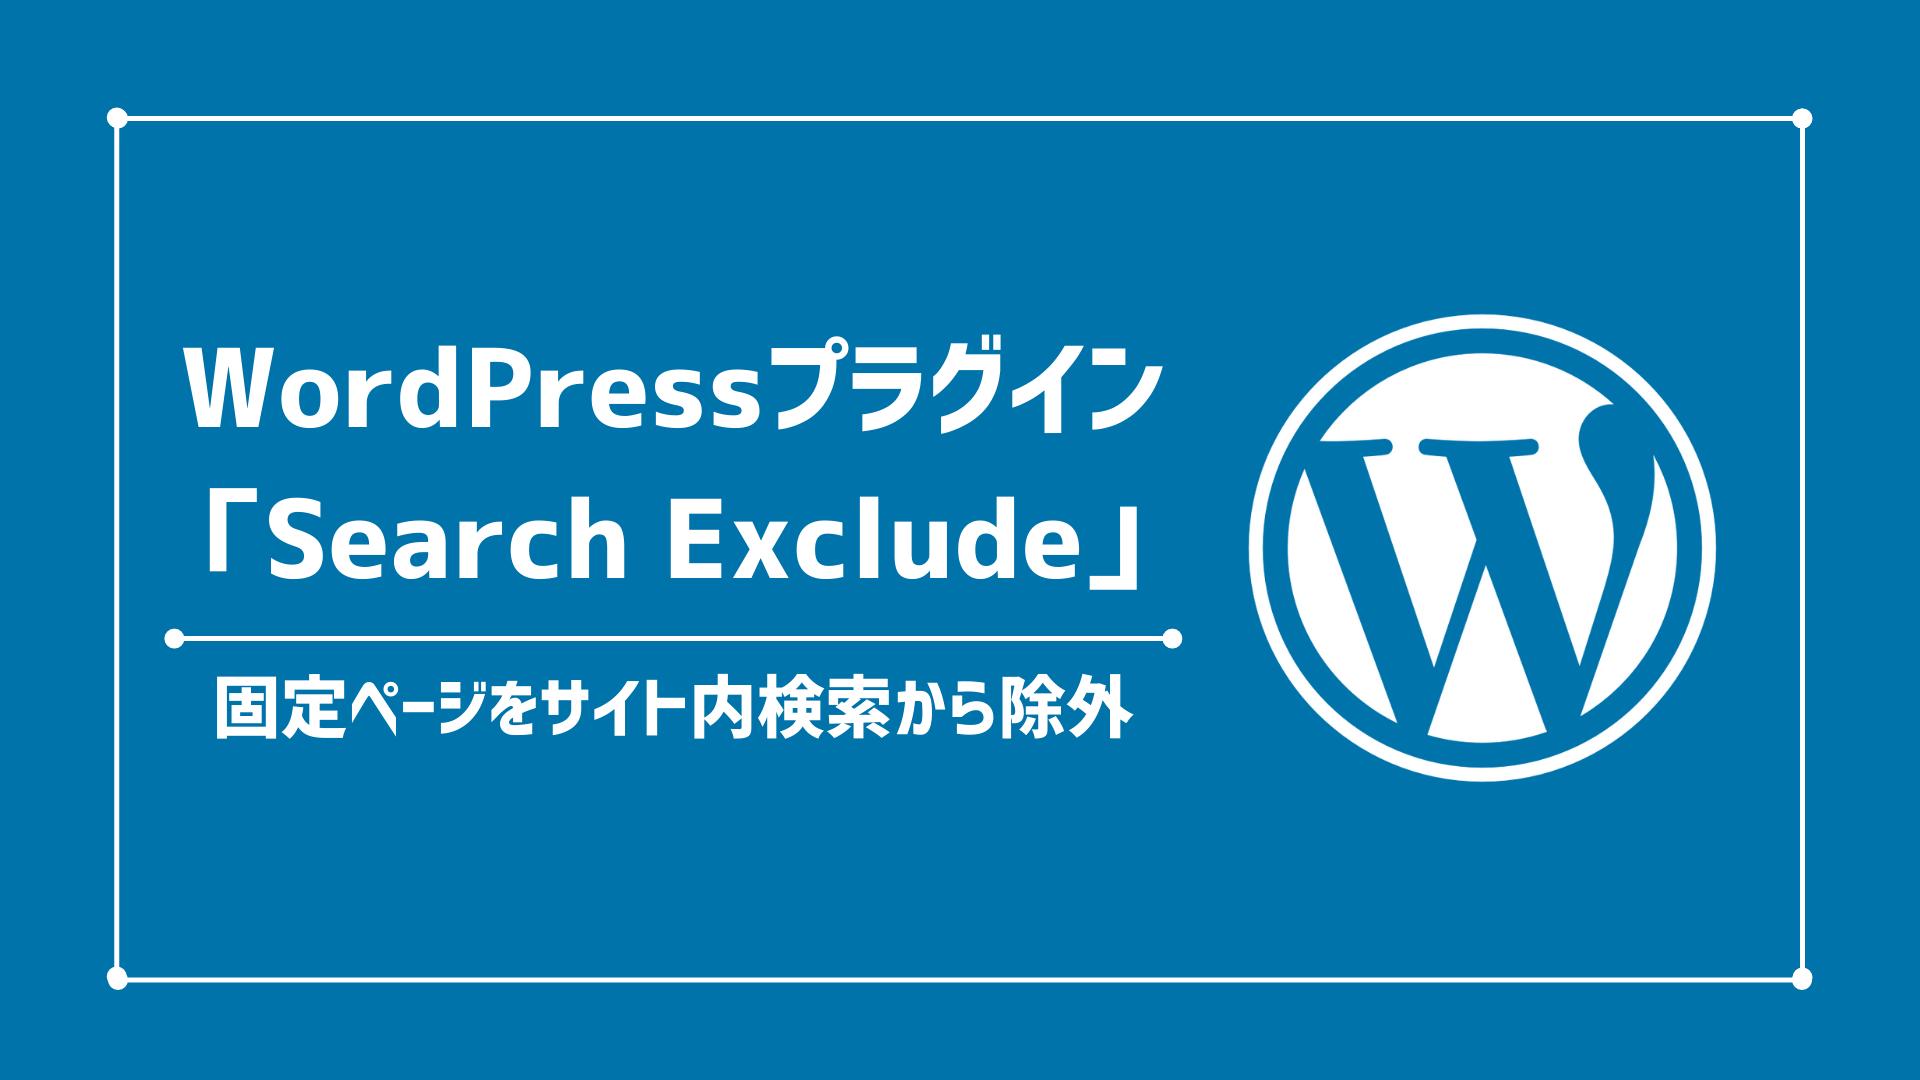 『Search Exclude 』サイト内検索から固定ページを除外するプラグイン